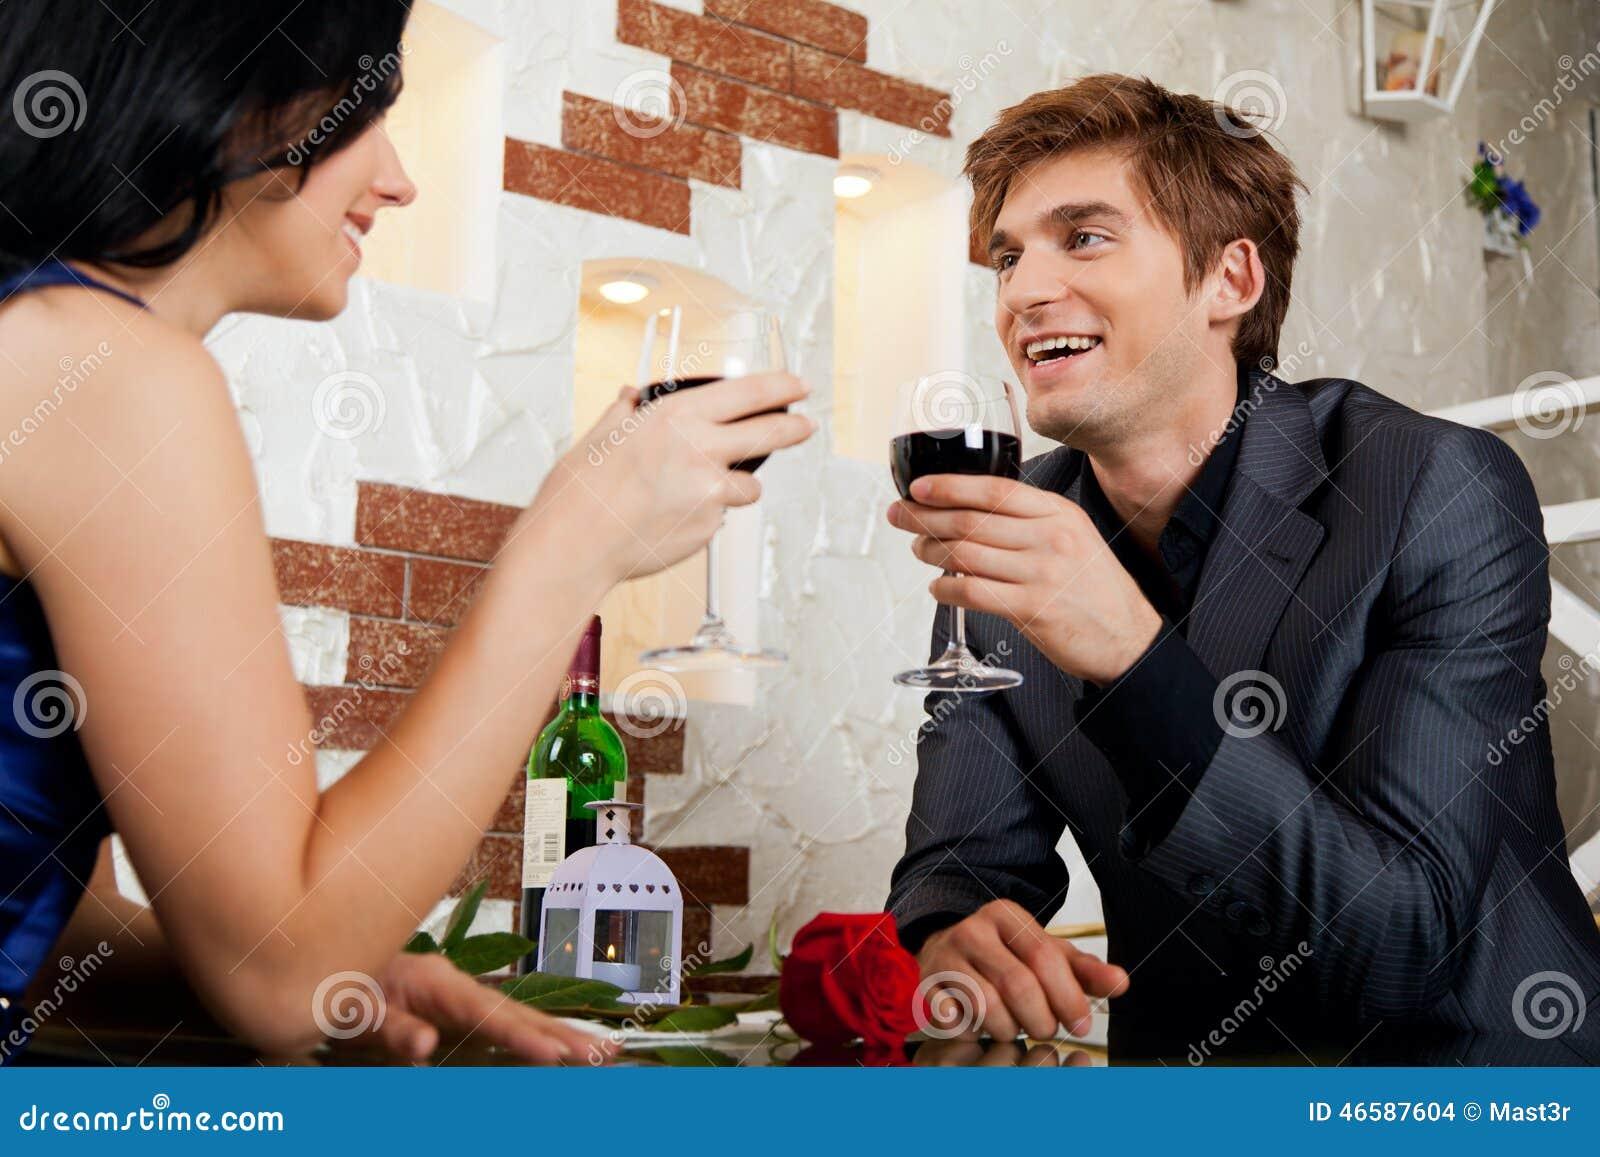 dating an alcoholic boyfriend